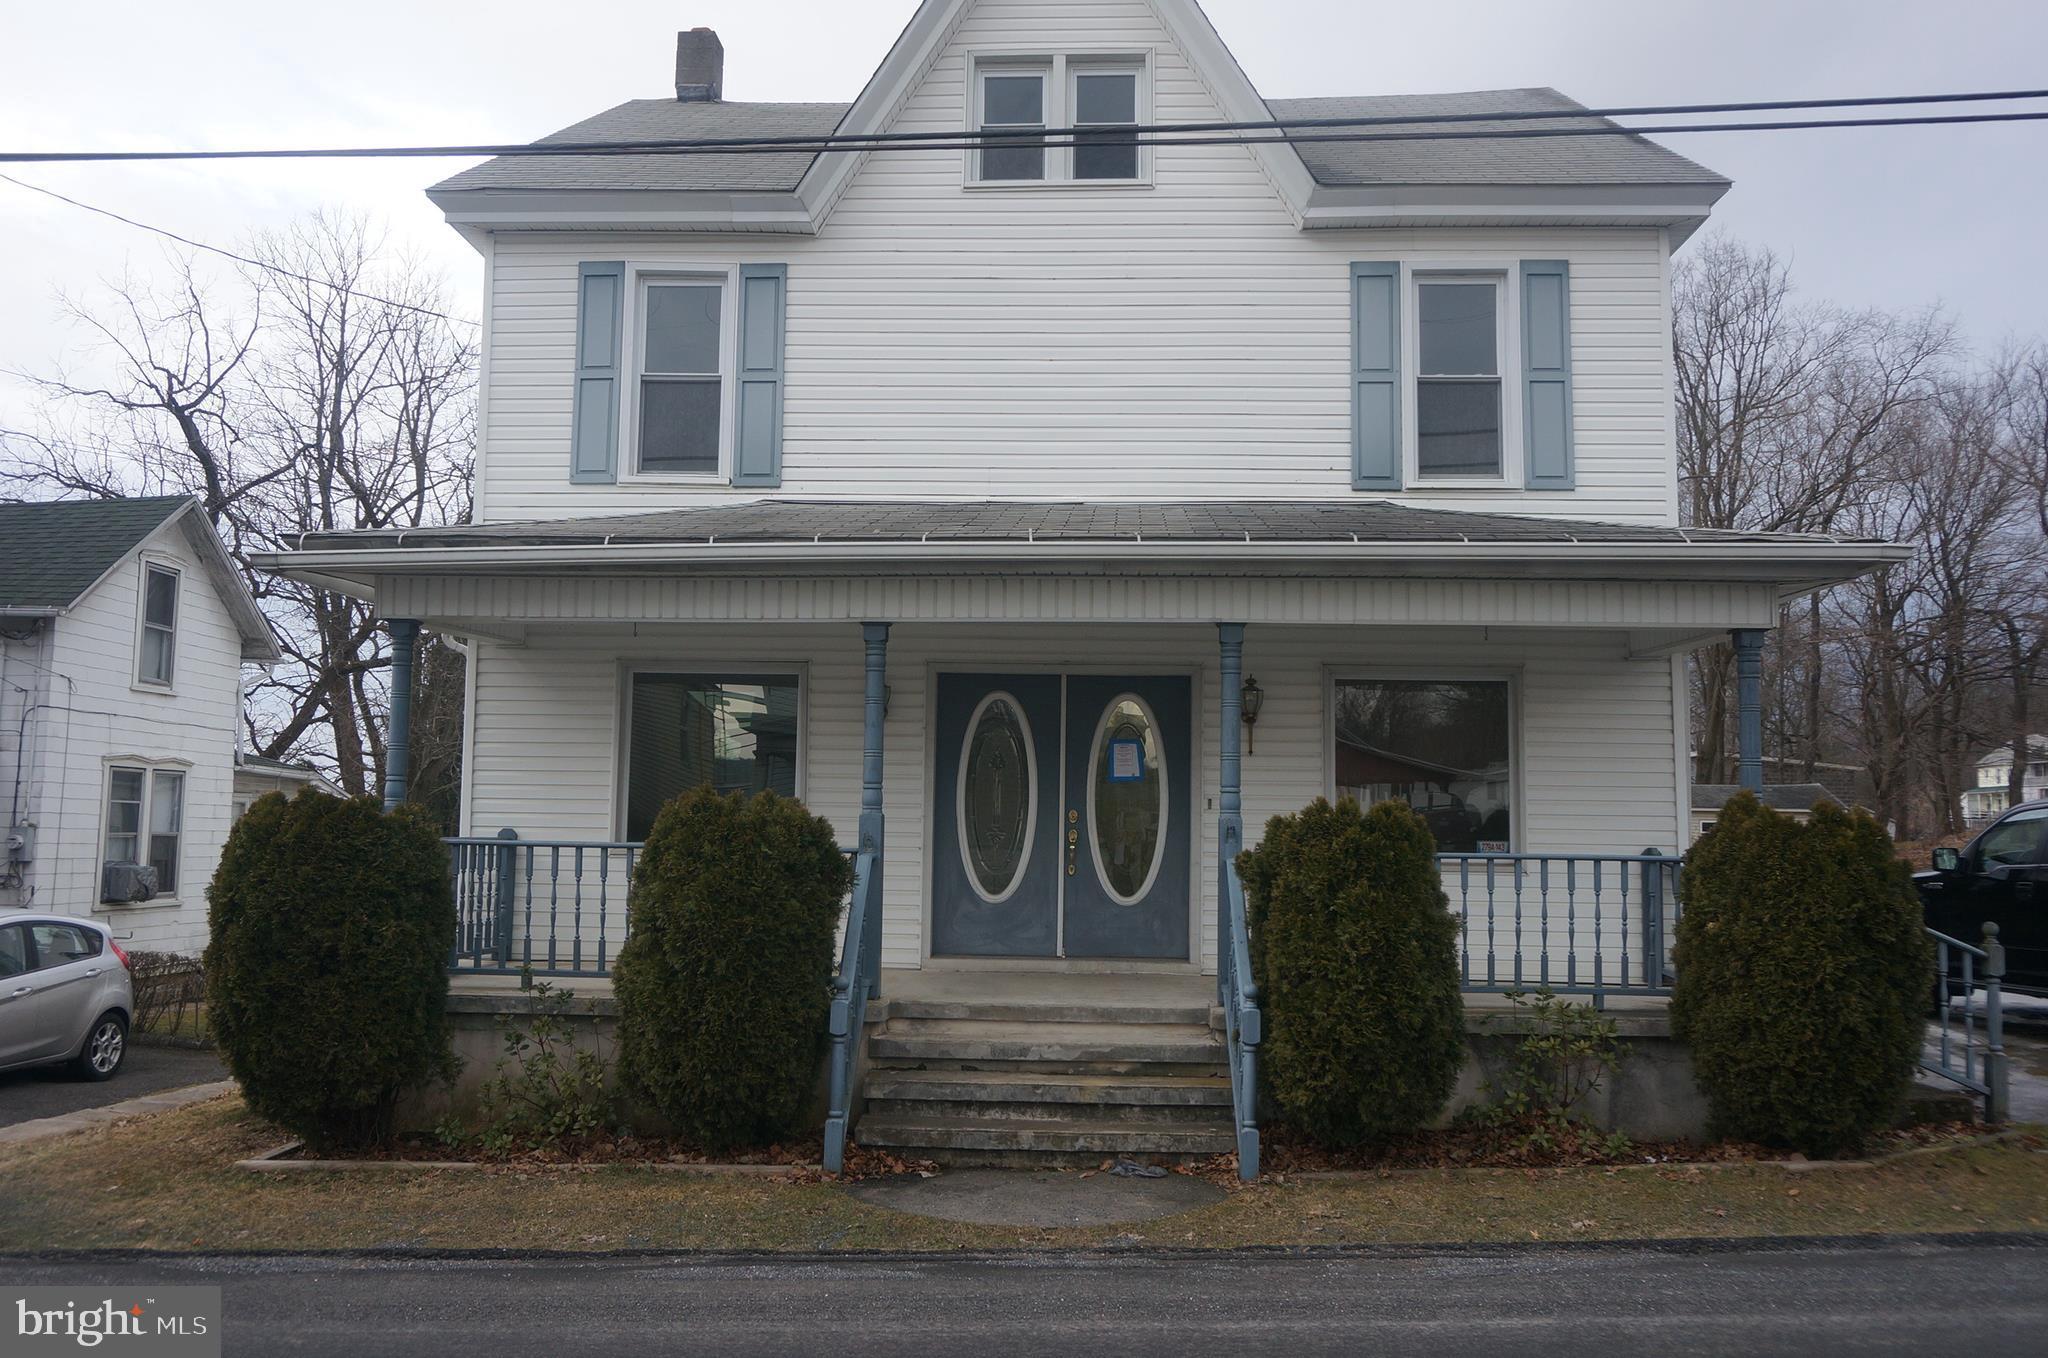 210 N KEYSTONE STREET, MUIR, PA 17957